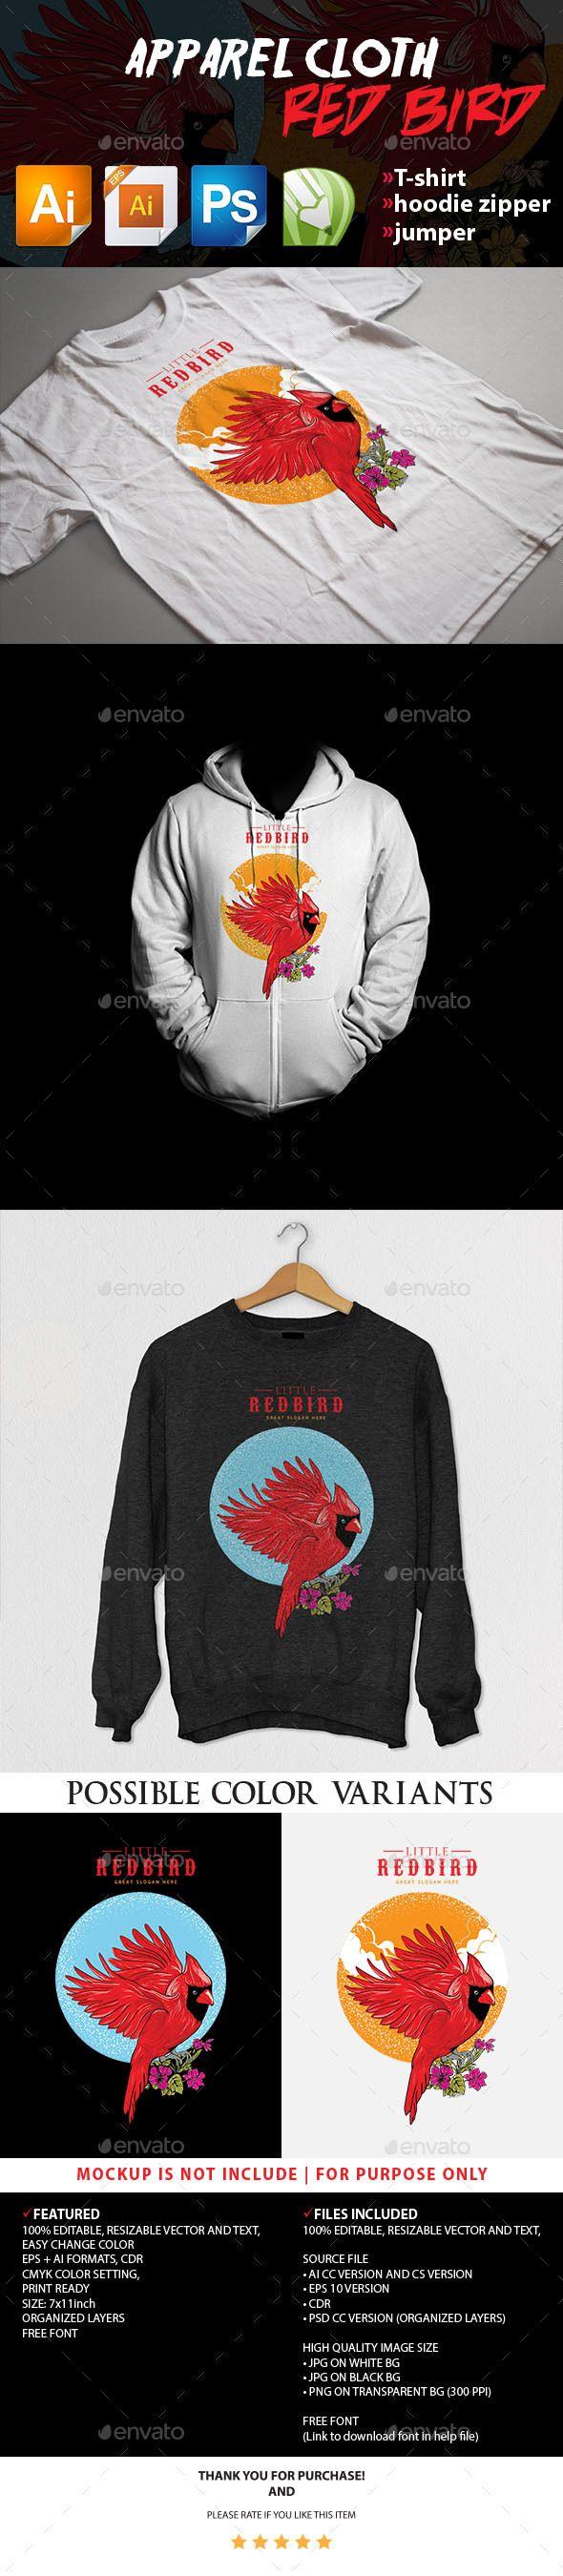 Download Red Bird Apparel Cloth Clothing Logo Human Logo Inspiration Shirt Print Design